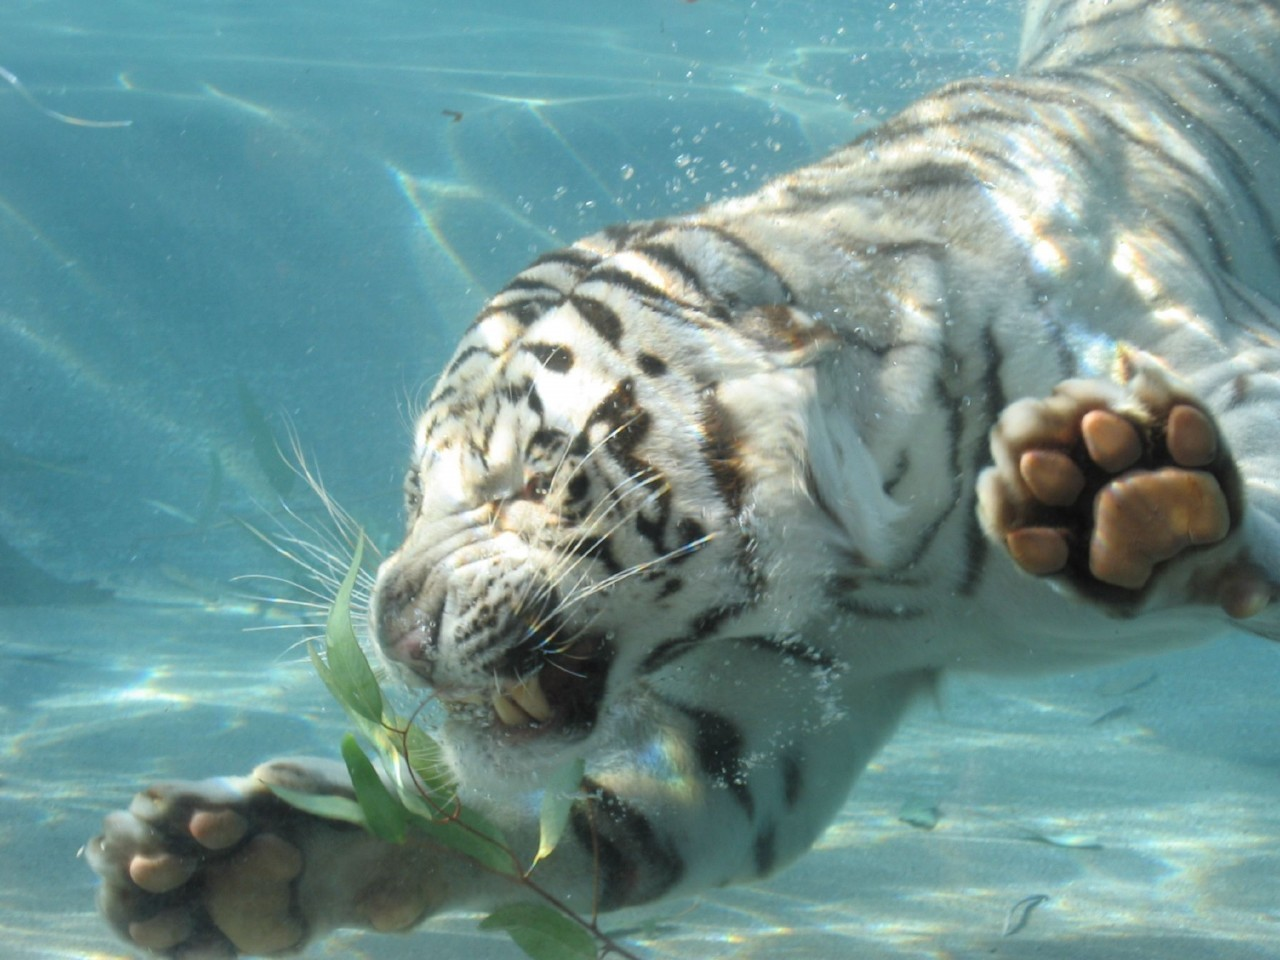 white tiger swimming 1280x960 En Güzel HD Masaüstü Kaplan Resimleri